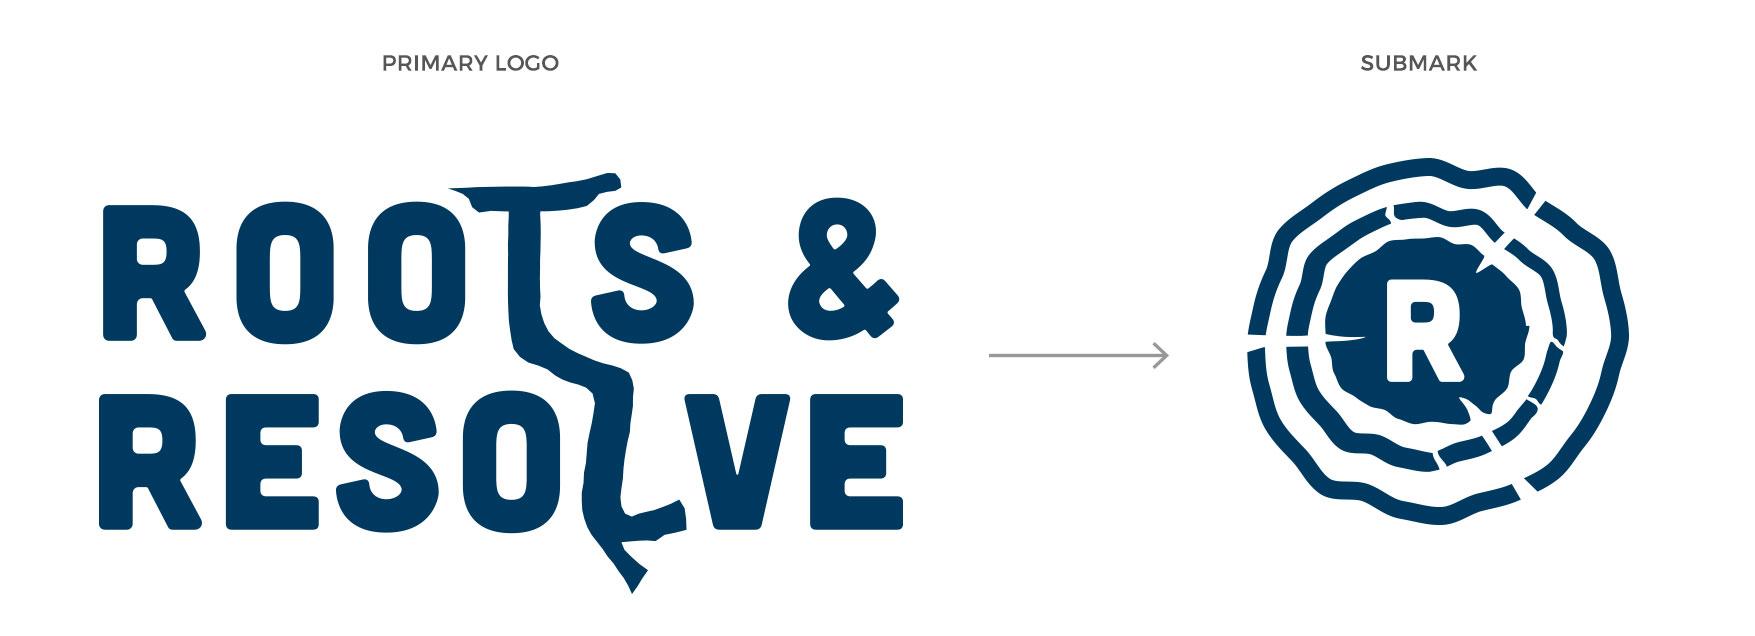 Roots & Resolve logo versus submark